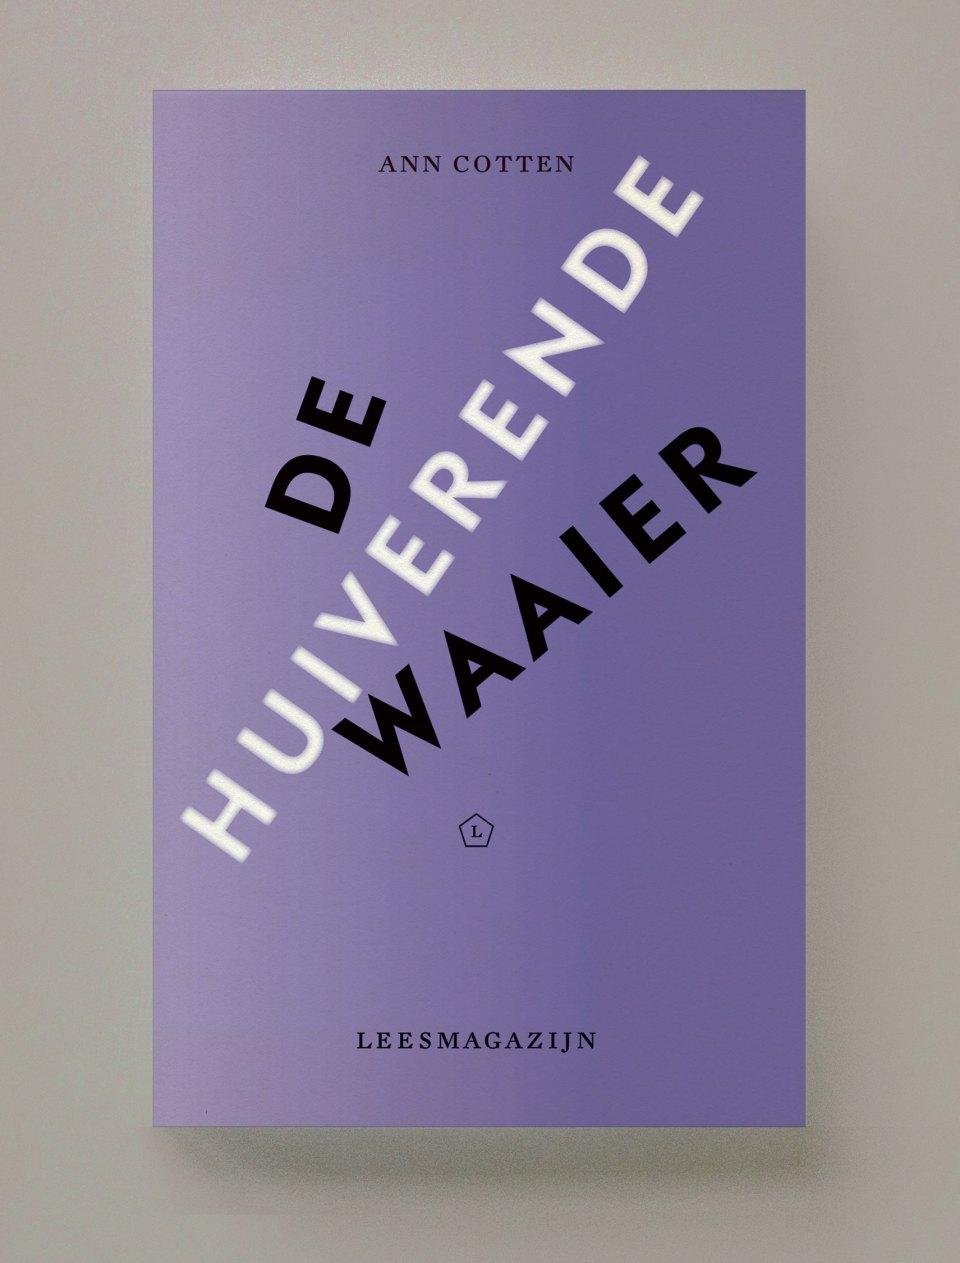 cover-HuiverendeWaaier-Highres